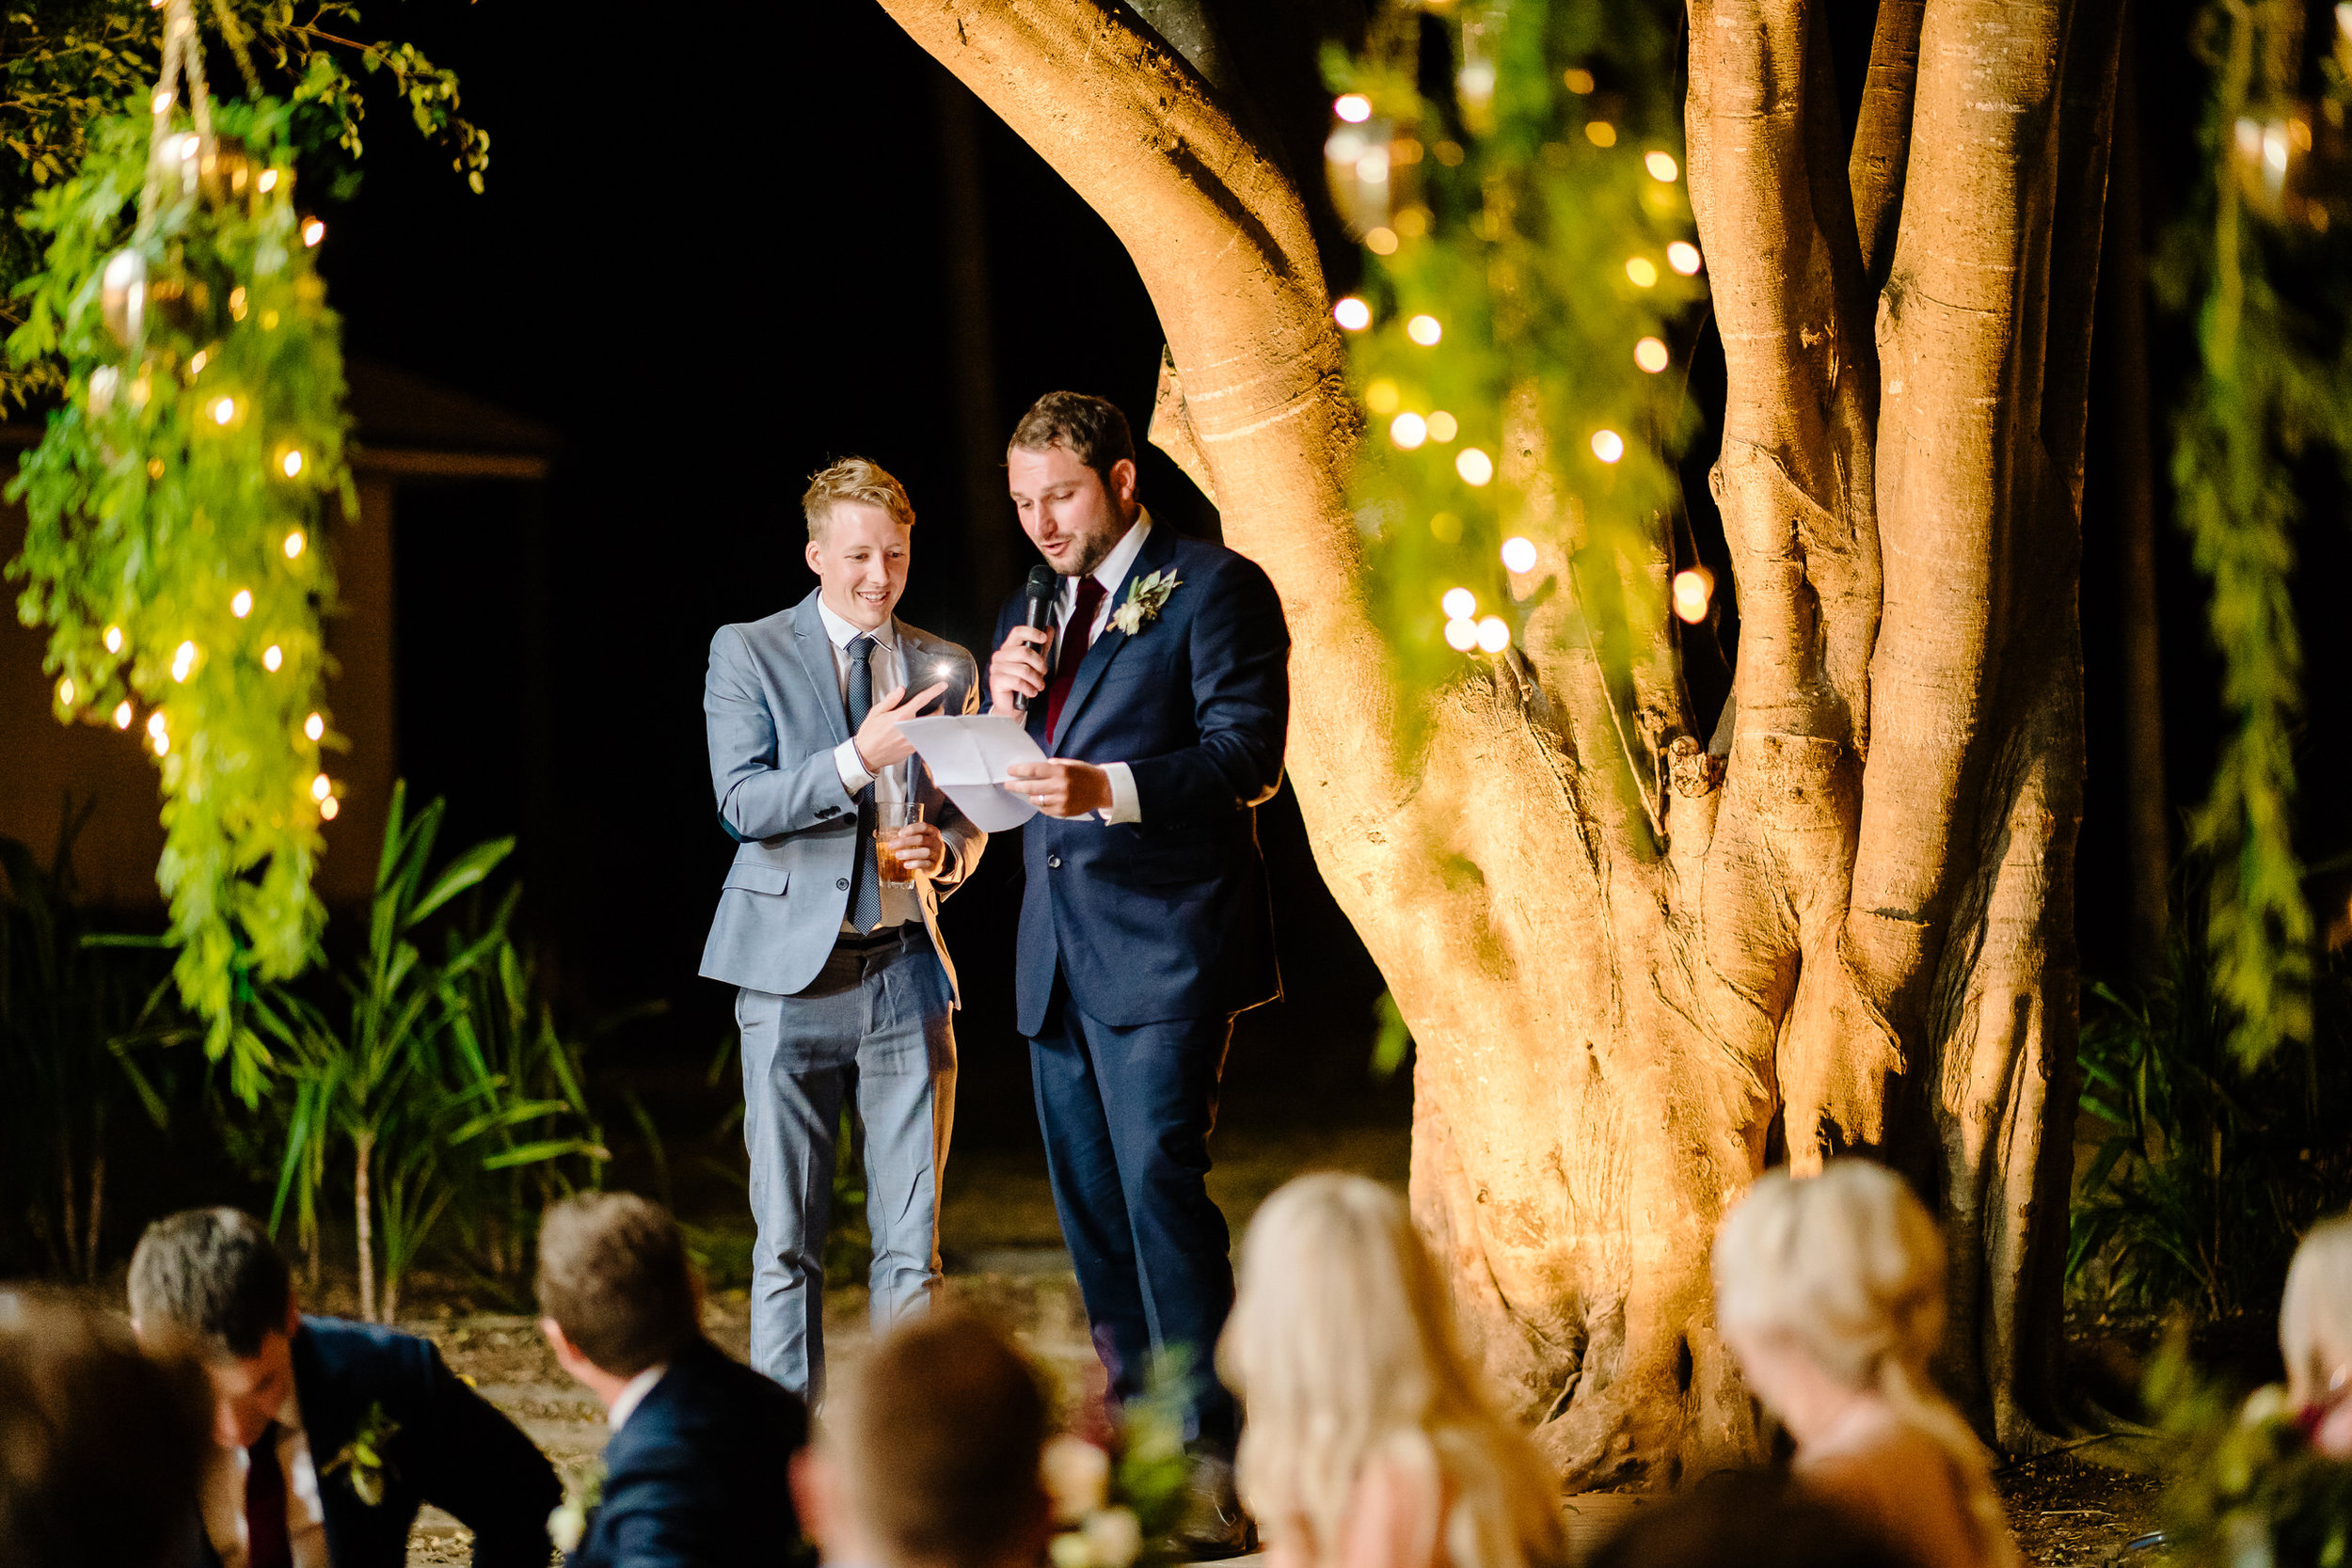 Justin_And_Jim_Photography_Byron_Bay_Wedding107.JPG